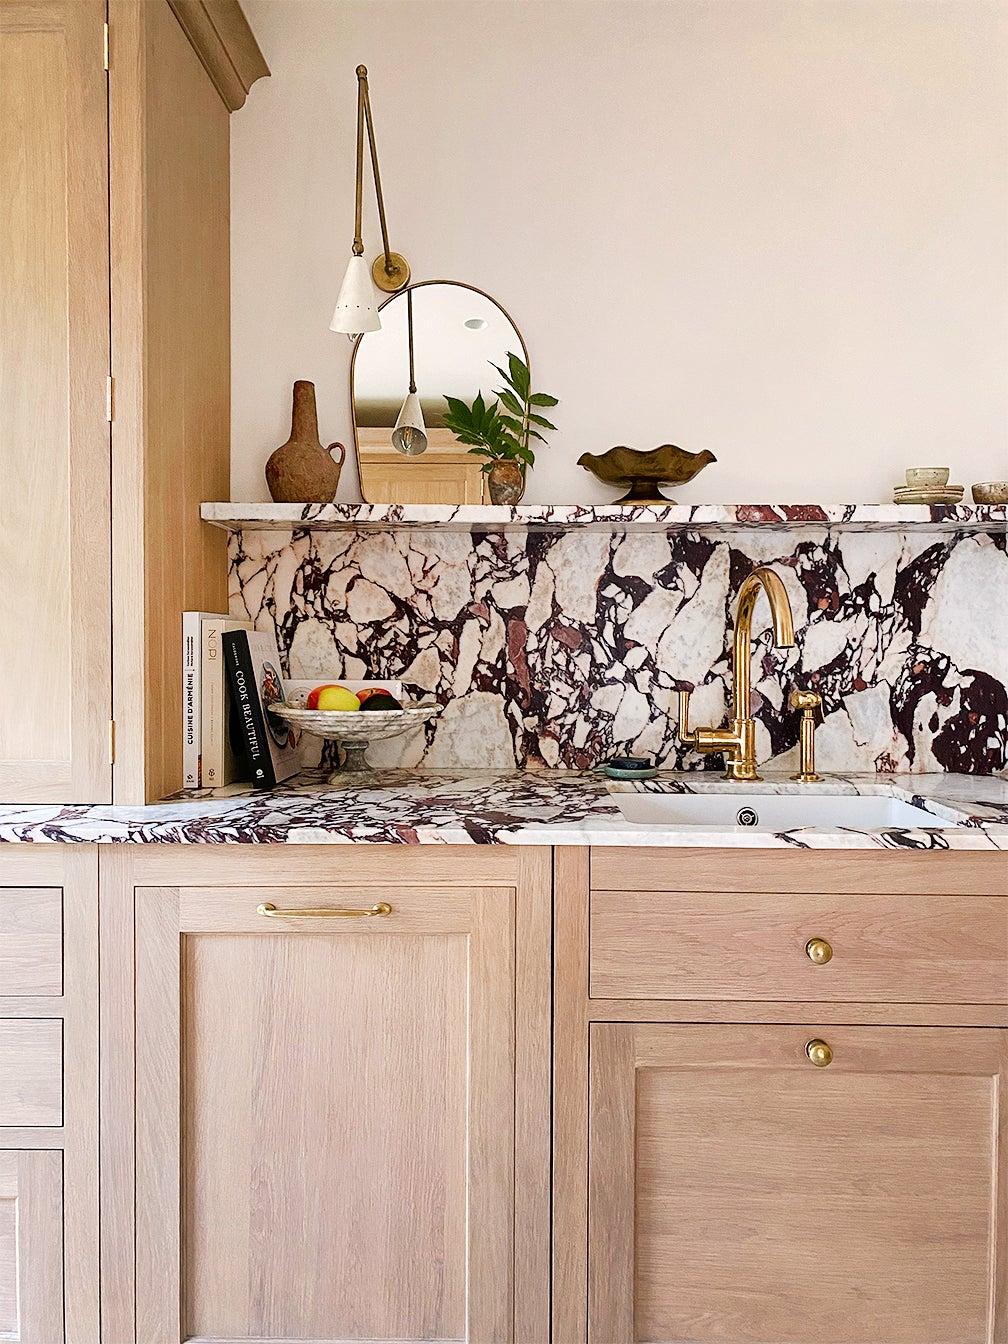 00-FEATURE-Becca-Loyer-Kitchen-renovation-domino